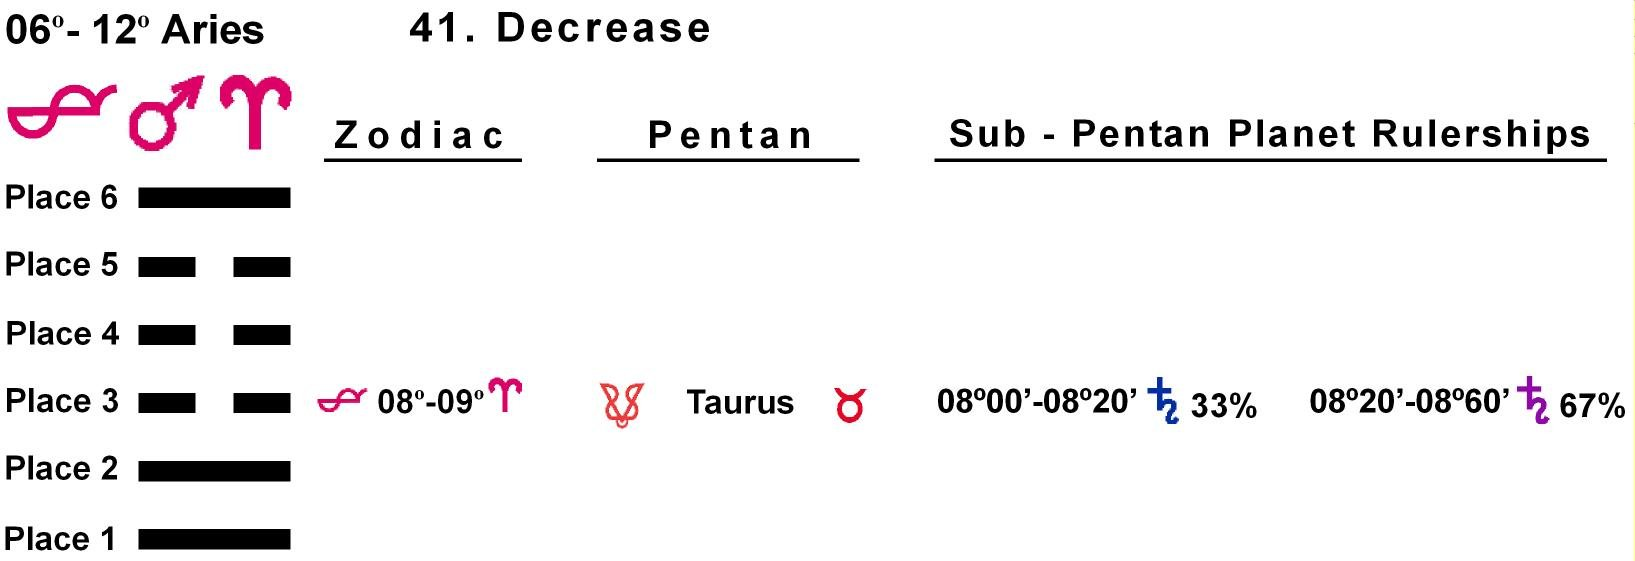 Pent-lines-01AR 08-09 Hx-41 Decrease